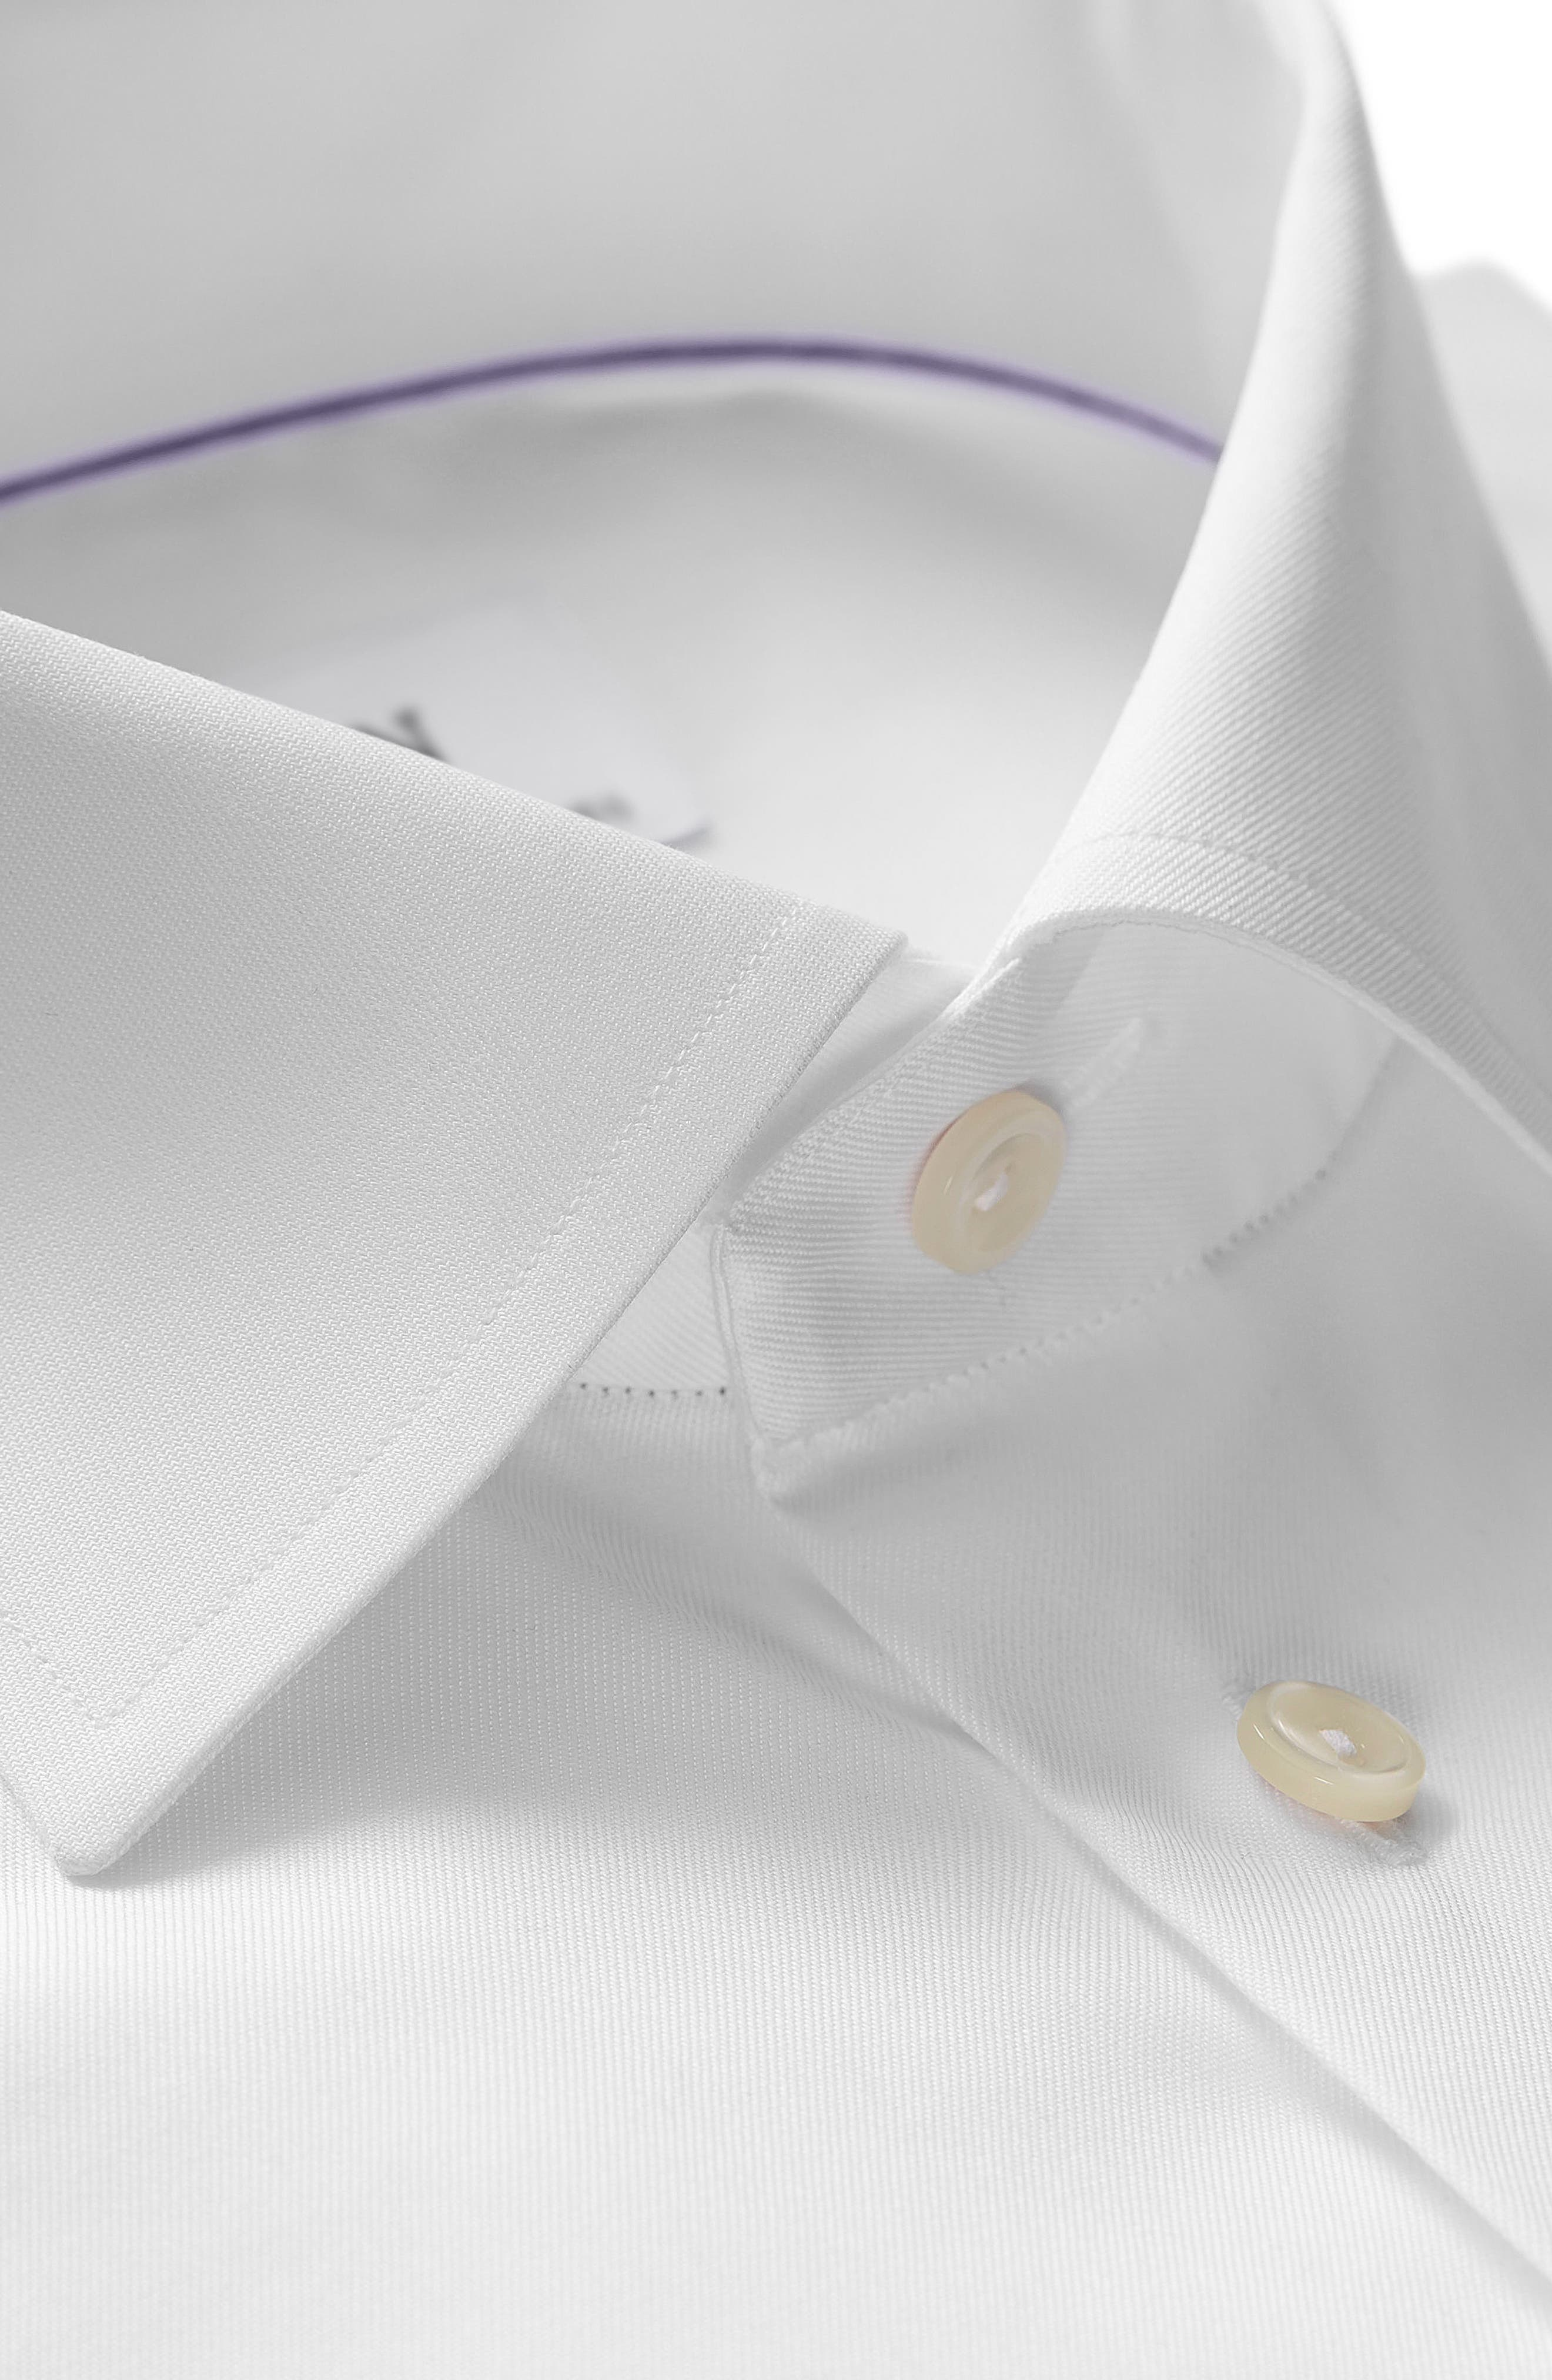 ETON, Slim Fit Twill Dress Shirt, Alternate thumbnail 3, color, WHITE